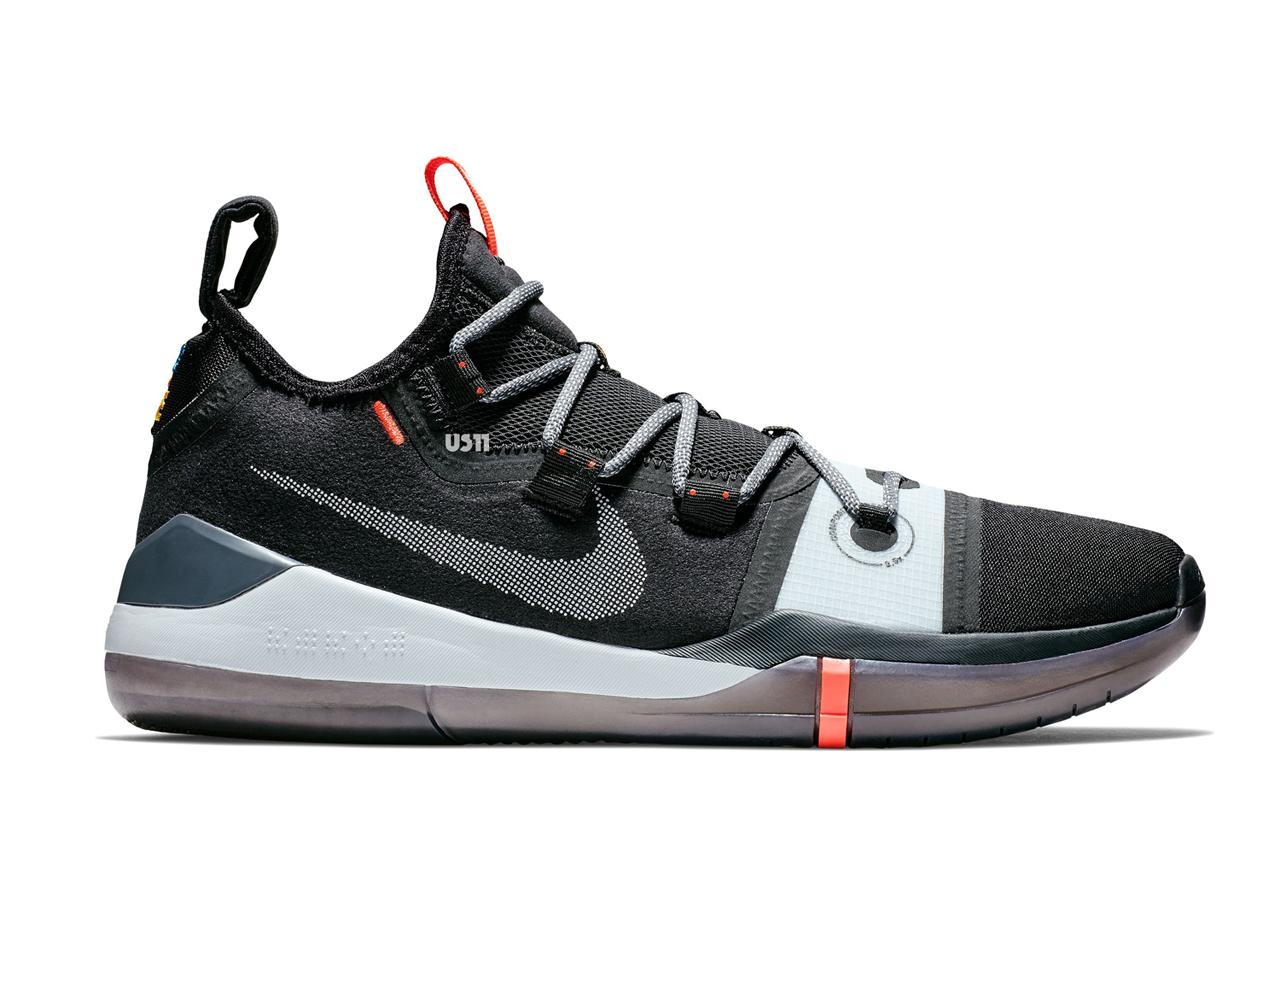 kobe bryant shoes 2018 price Shop